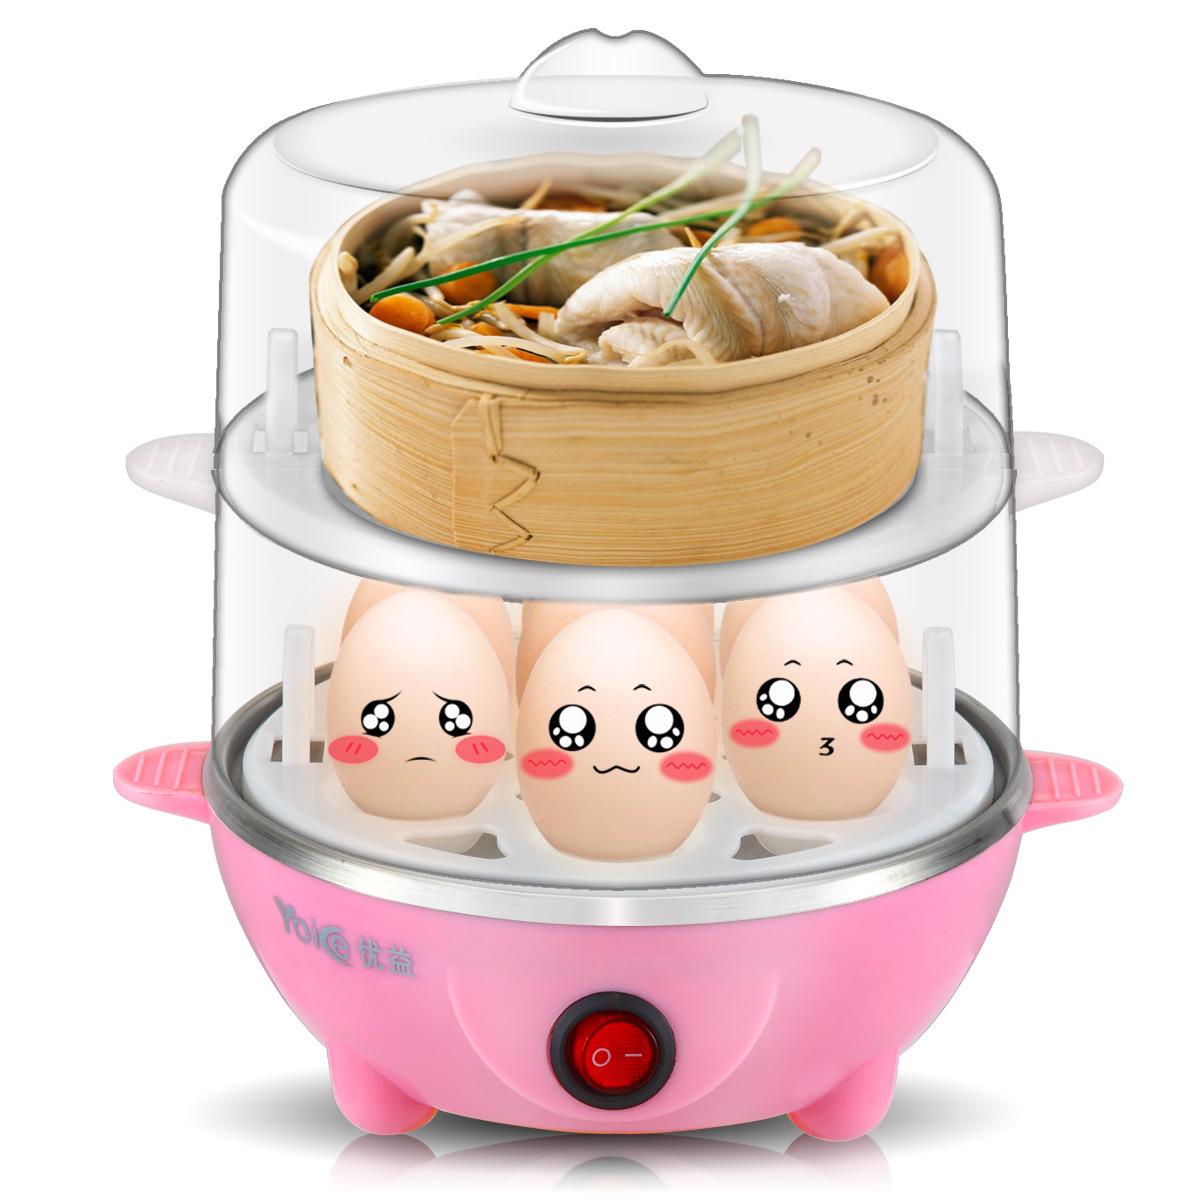 Яйцеварки из Китая